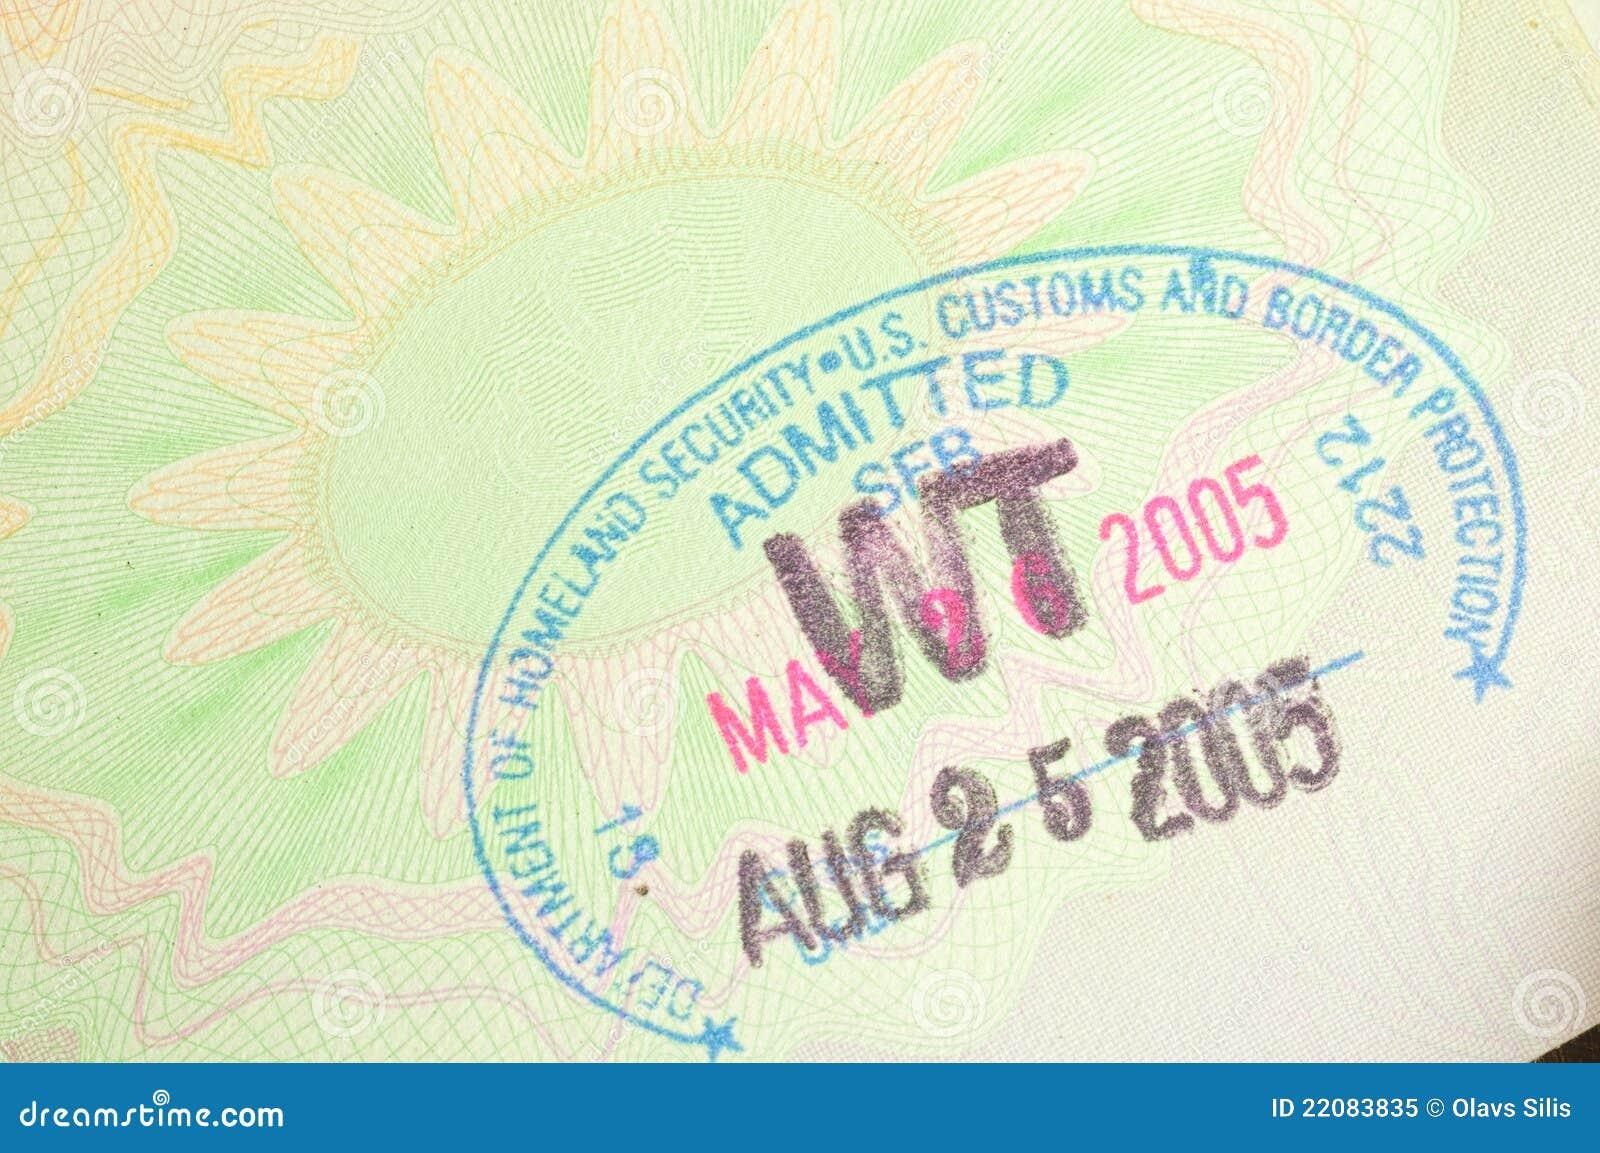 Department Immigration Australia Citizenship